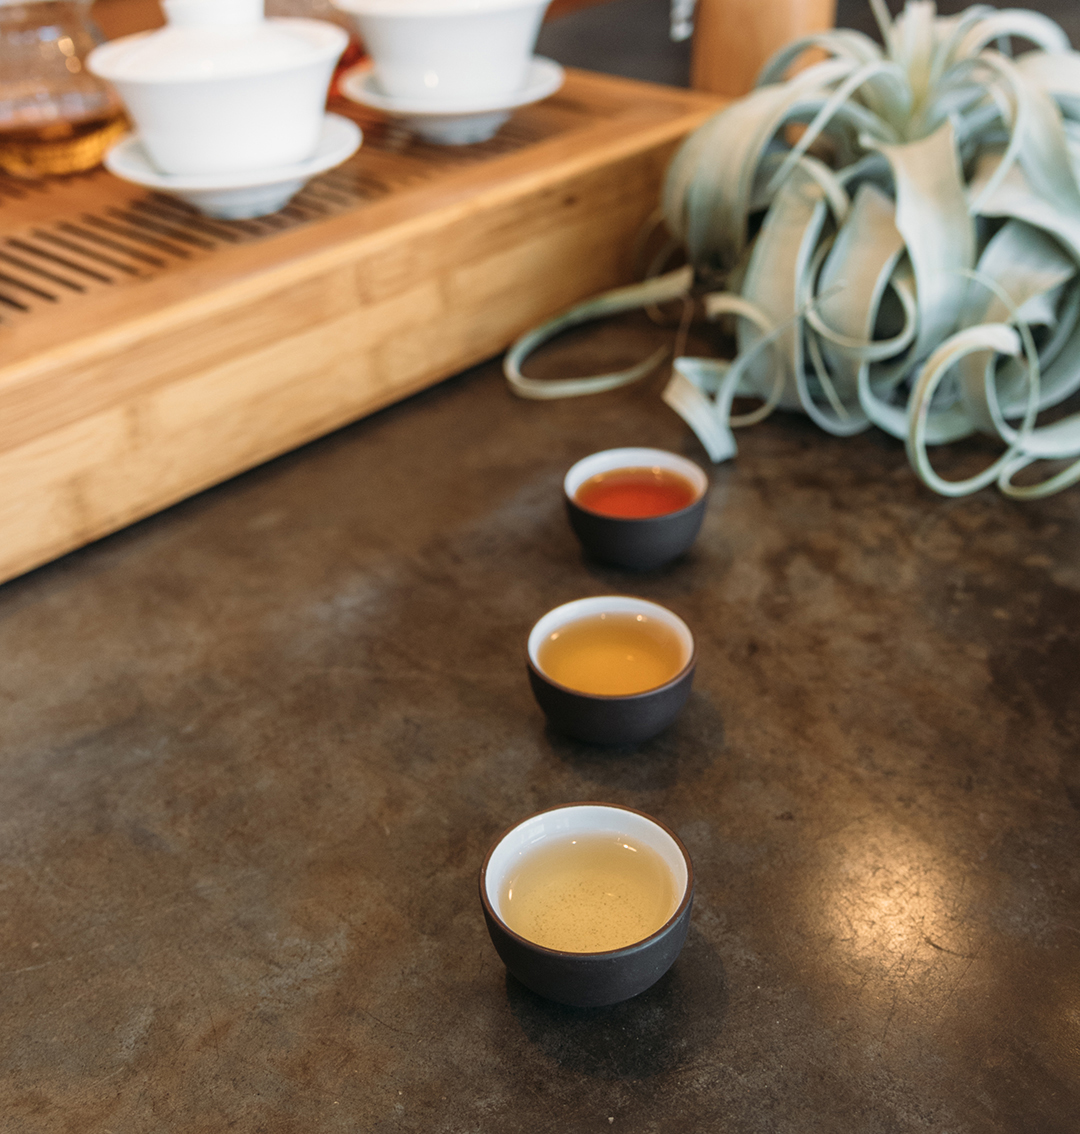 The Jasmine Pearl Tea Company